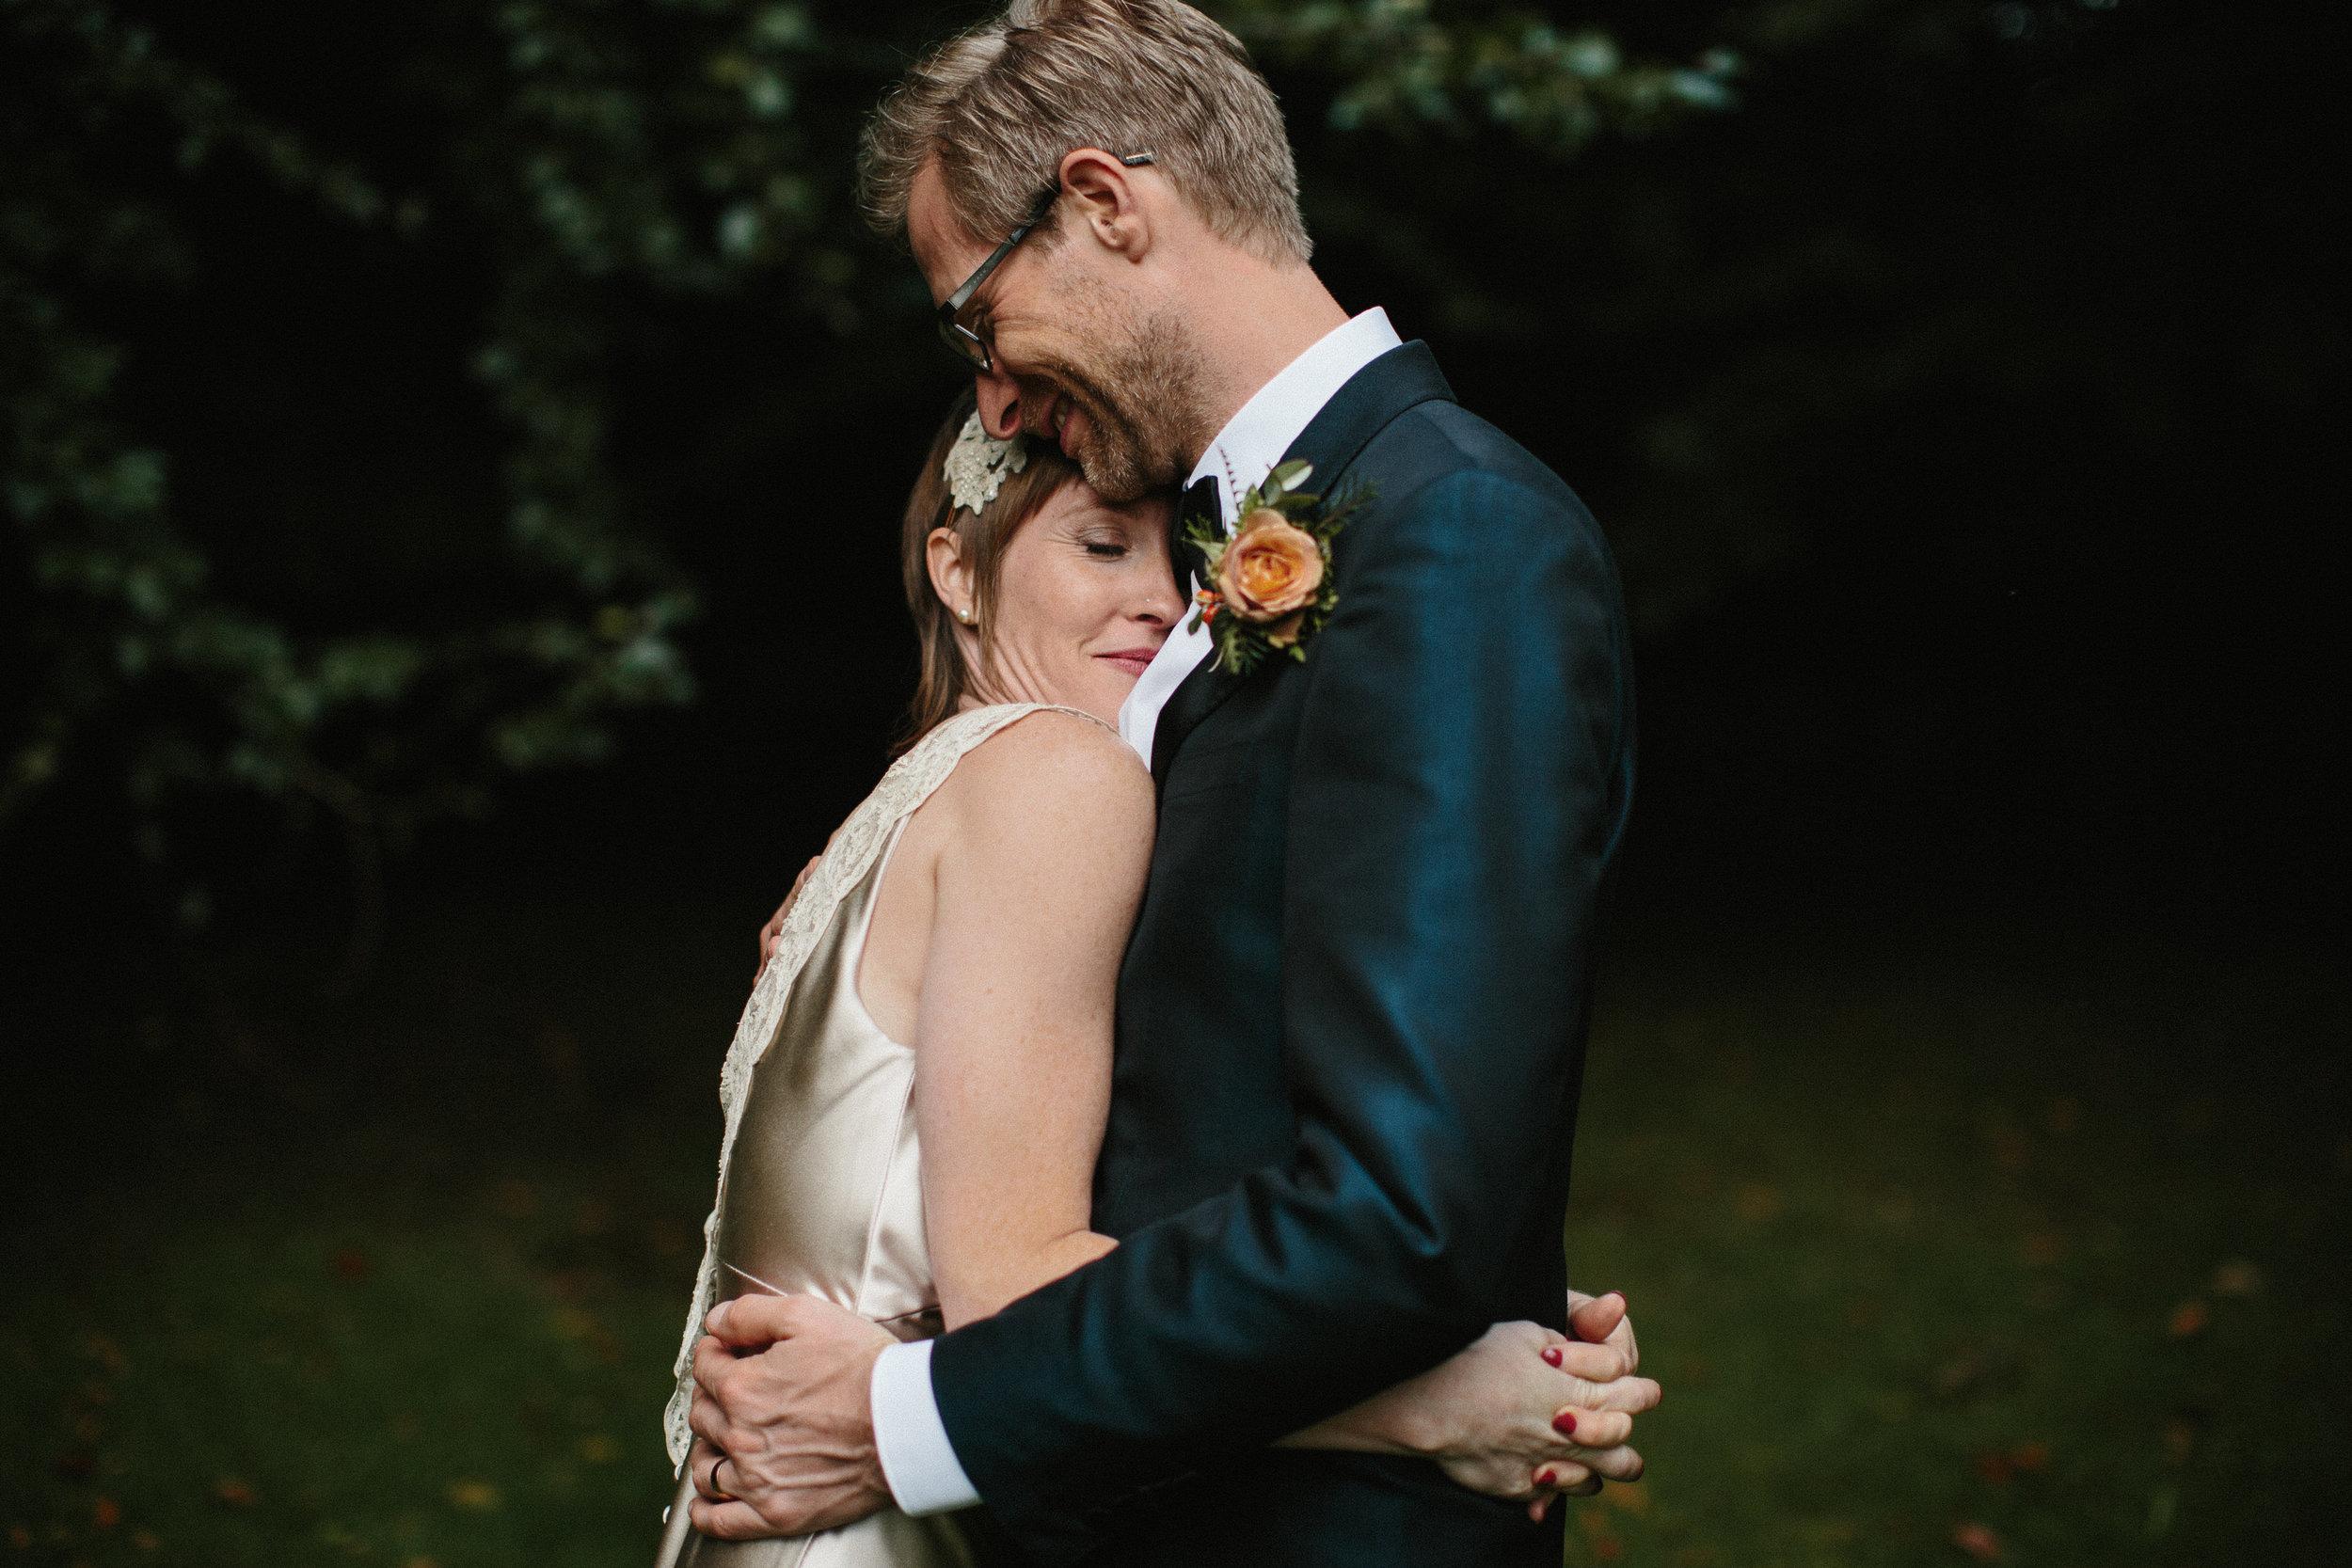 Kate-Beaumont-Sheffield-Honeysuckle-bias-cut-wedding-dress-oyster-Rosie34.jpg